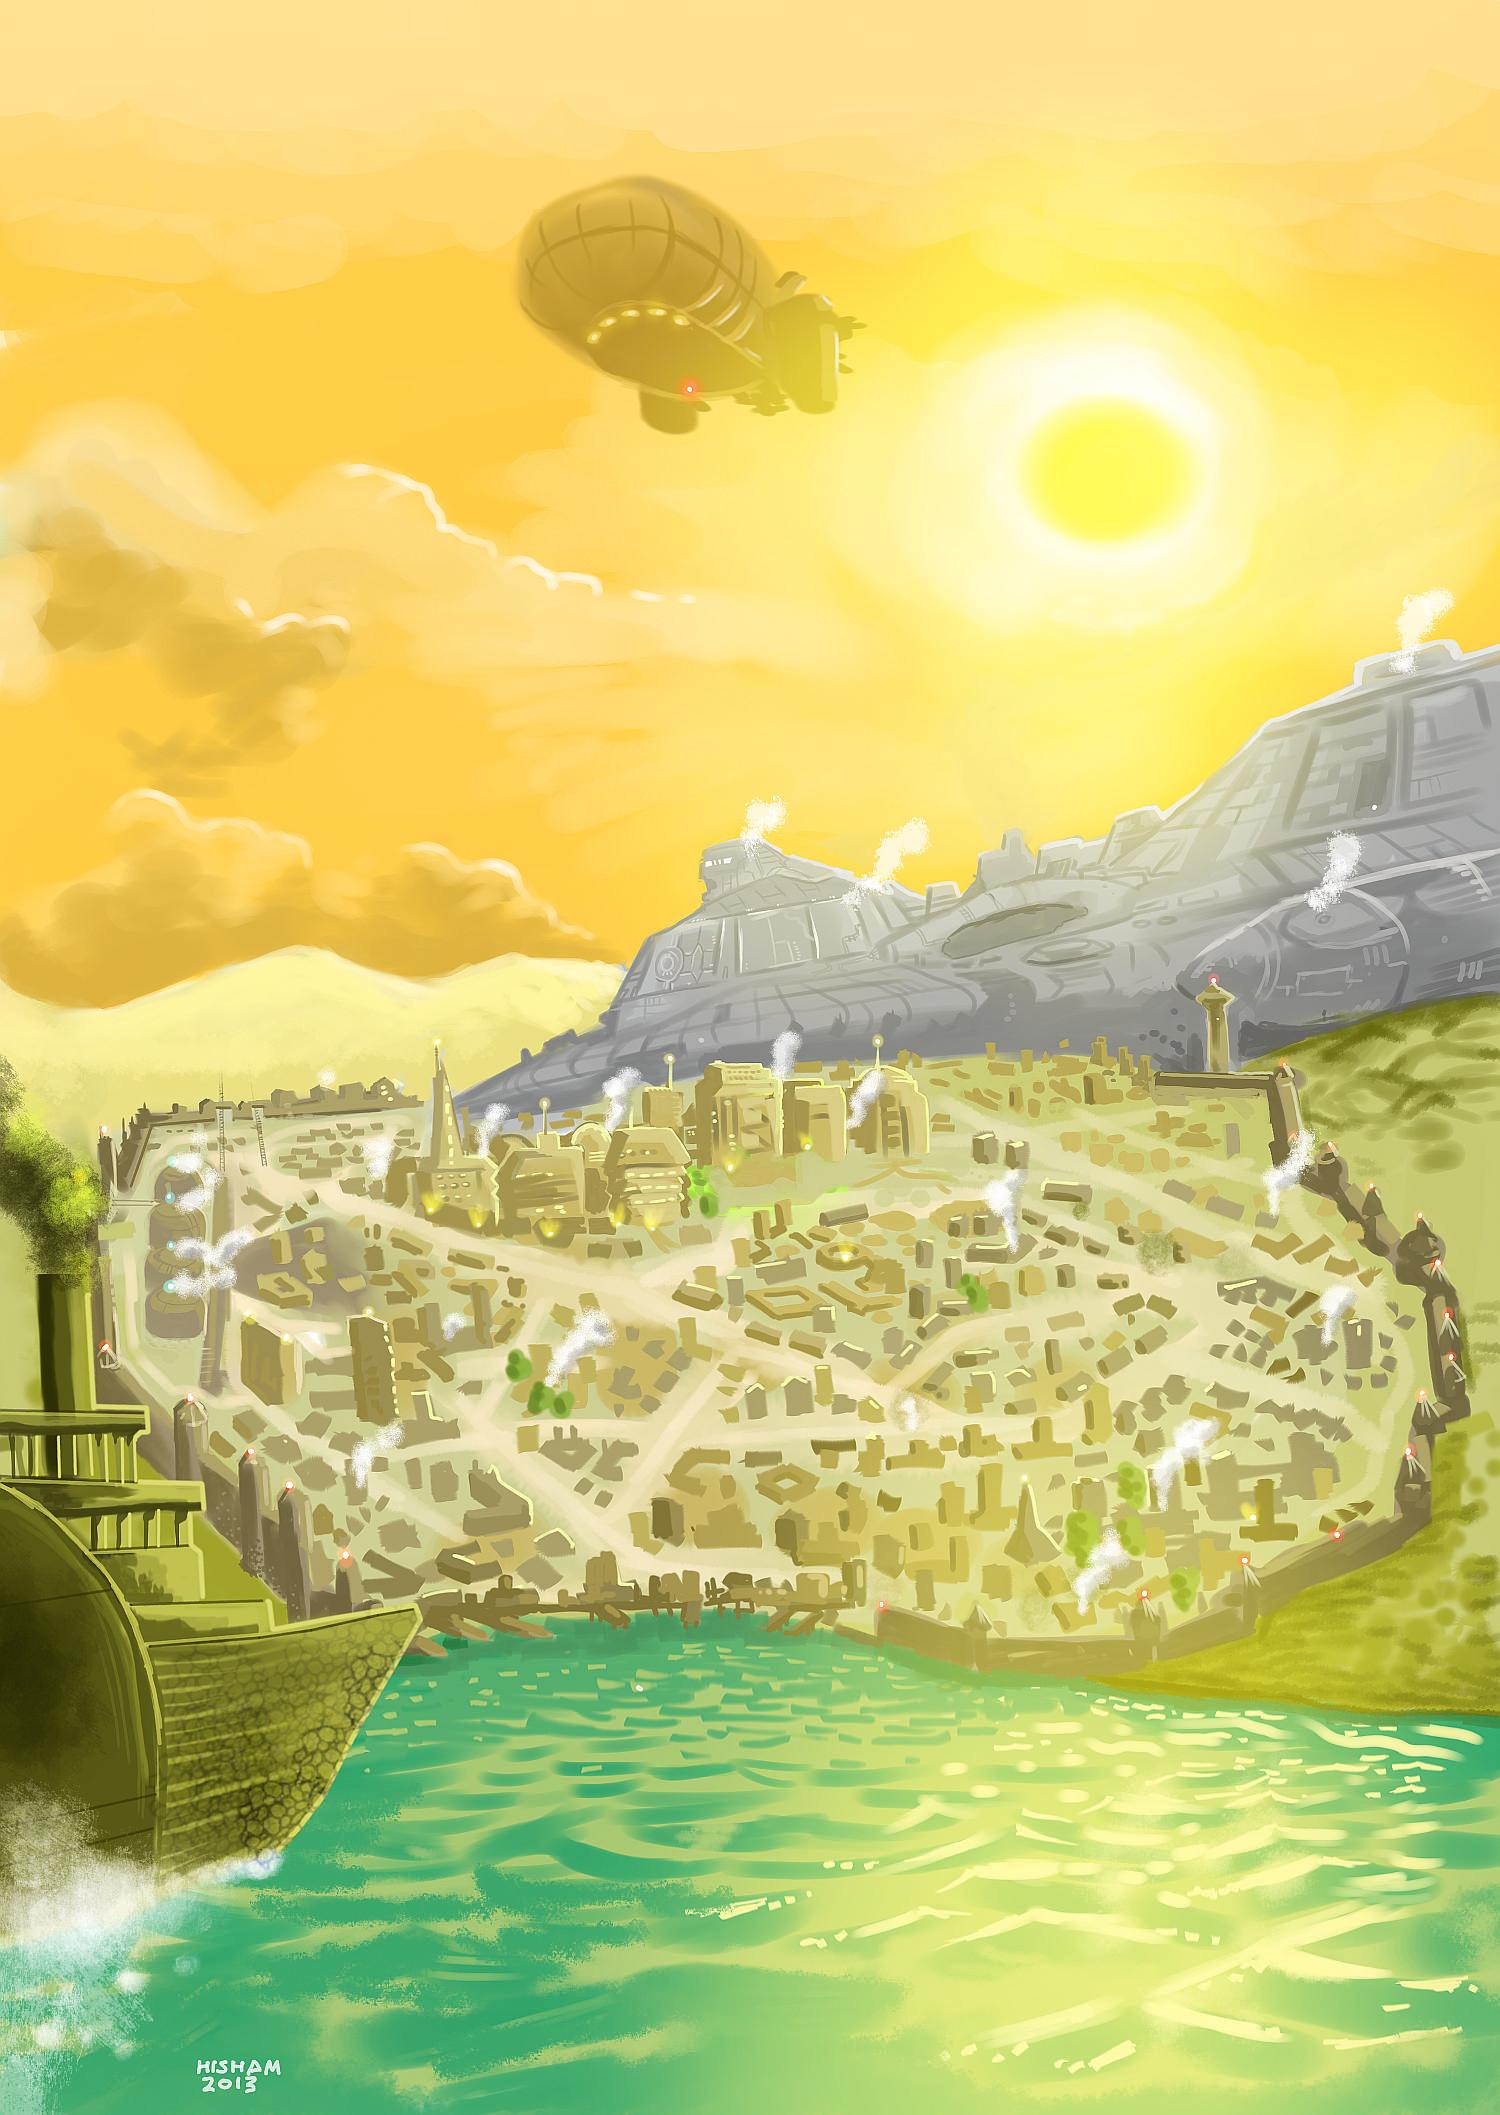 Khairul hisham capital city 1500px